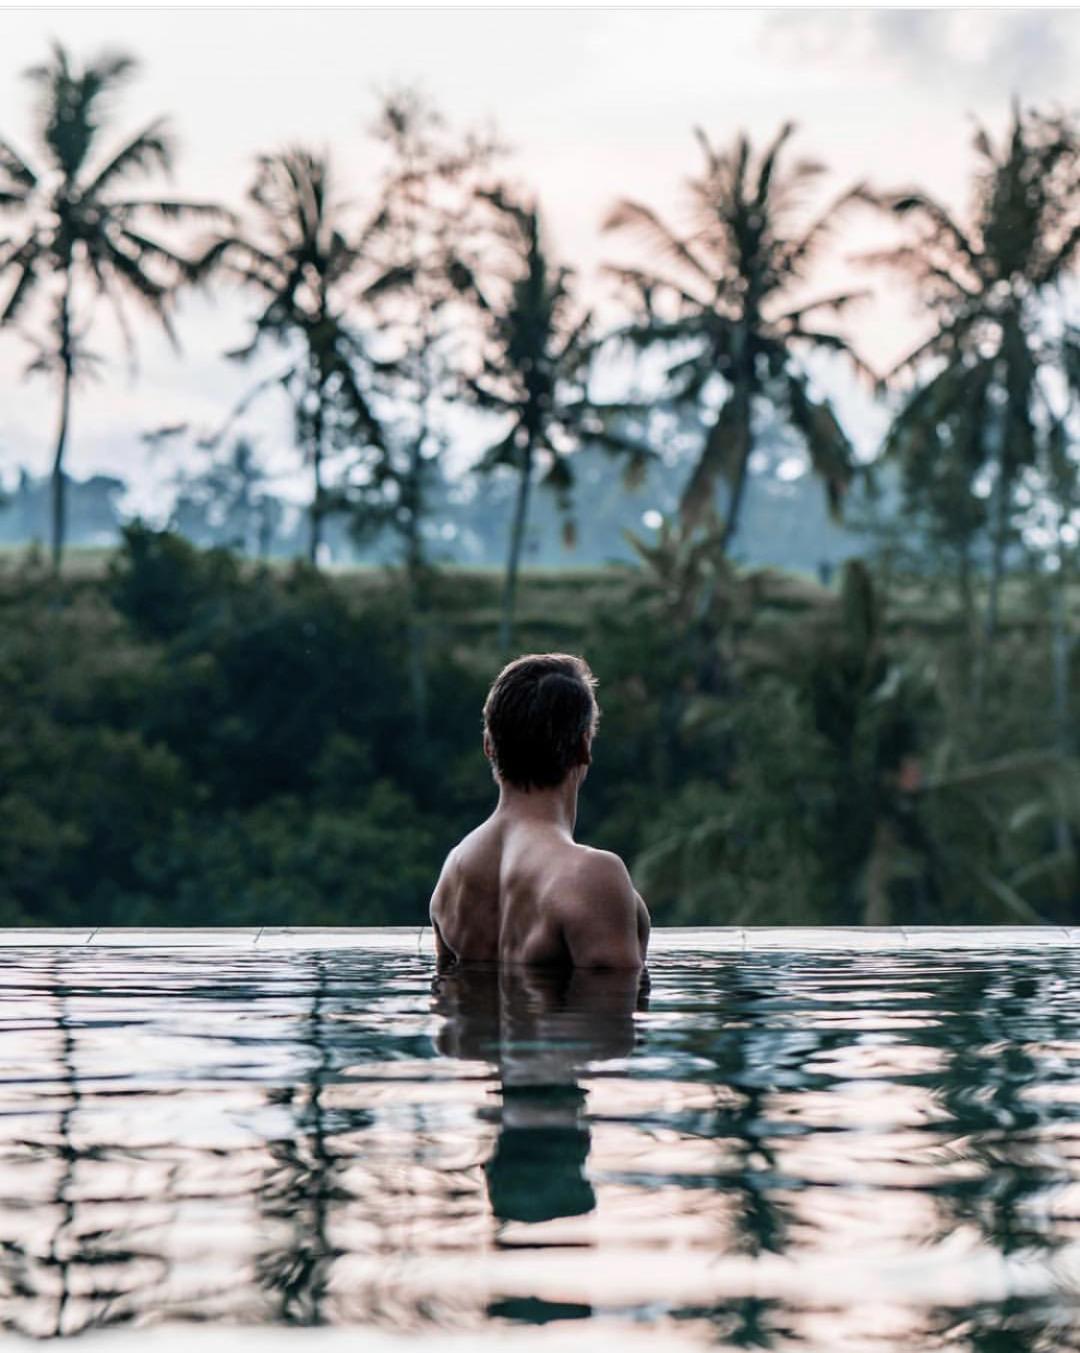 Luxe Suite Villa Cella Bella Insta Worthy Views Villas For Rent In Ubudubud Gianyar Bali Indonesia